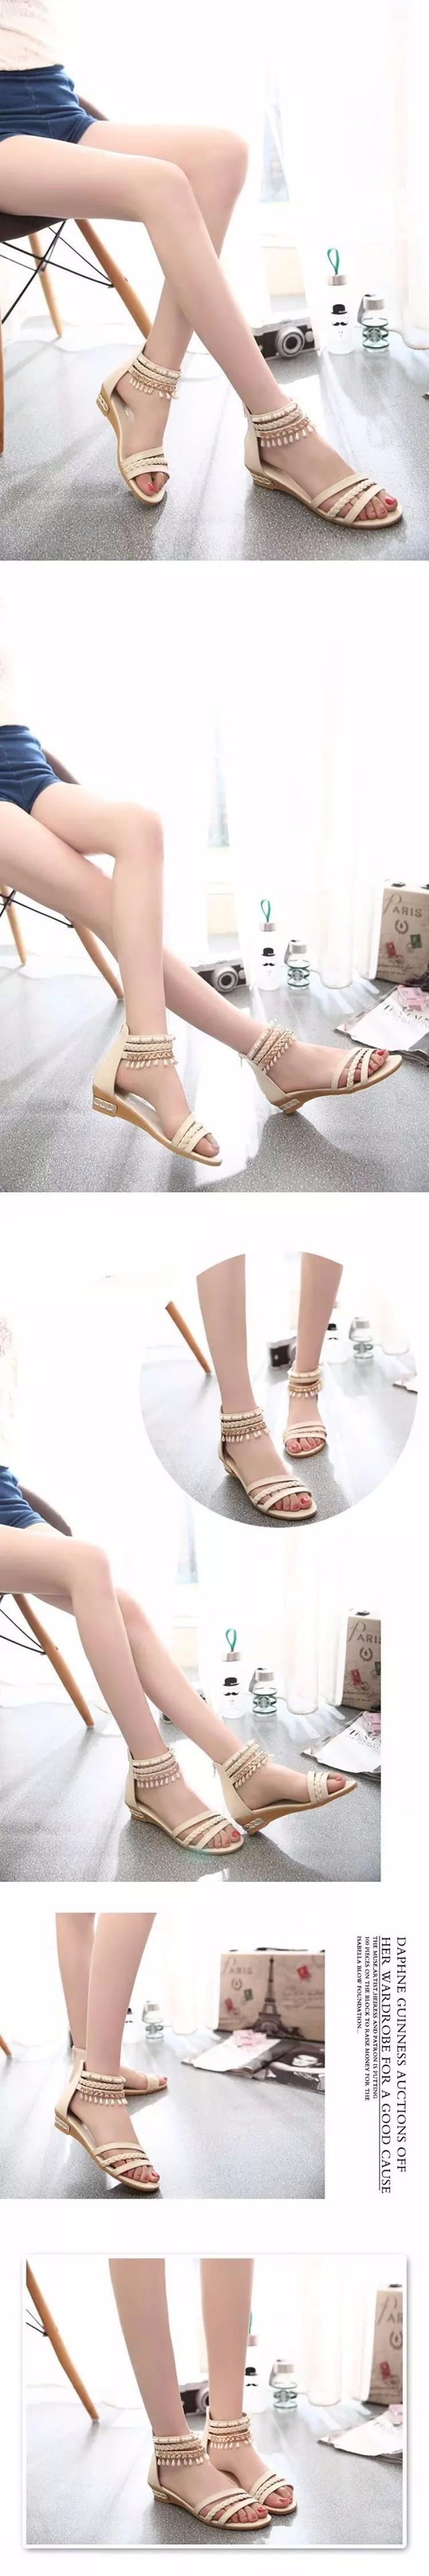 Hot Sale 2016 Summer Sweet Fashion Roman Beads Woman Sandals Leisure Peep Toe Wedges Shoes Wild Comfortable Ladies Sandals DT141 (8)